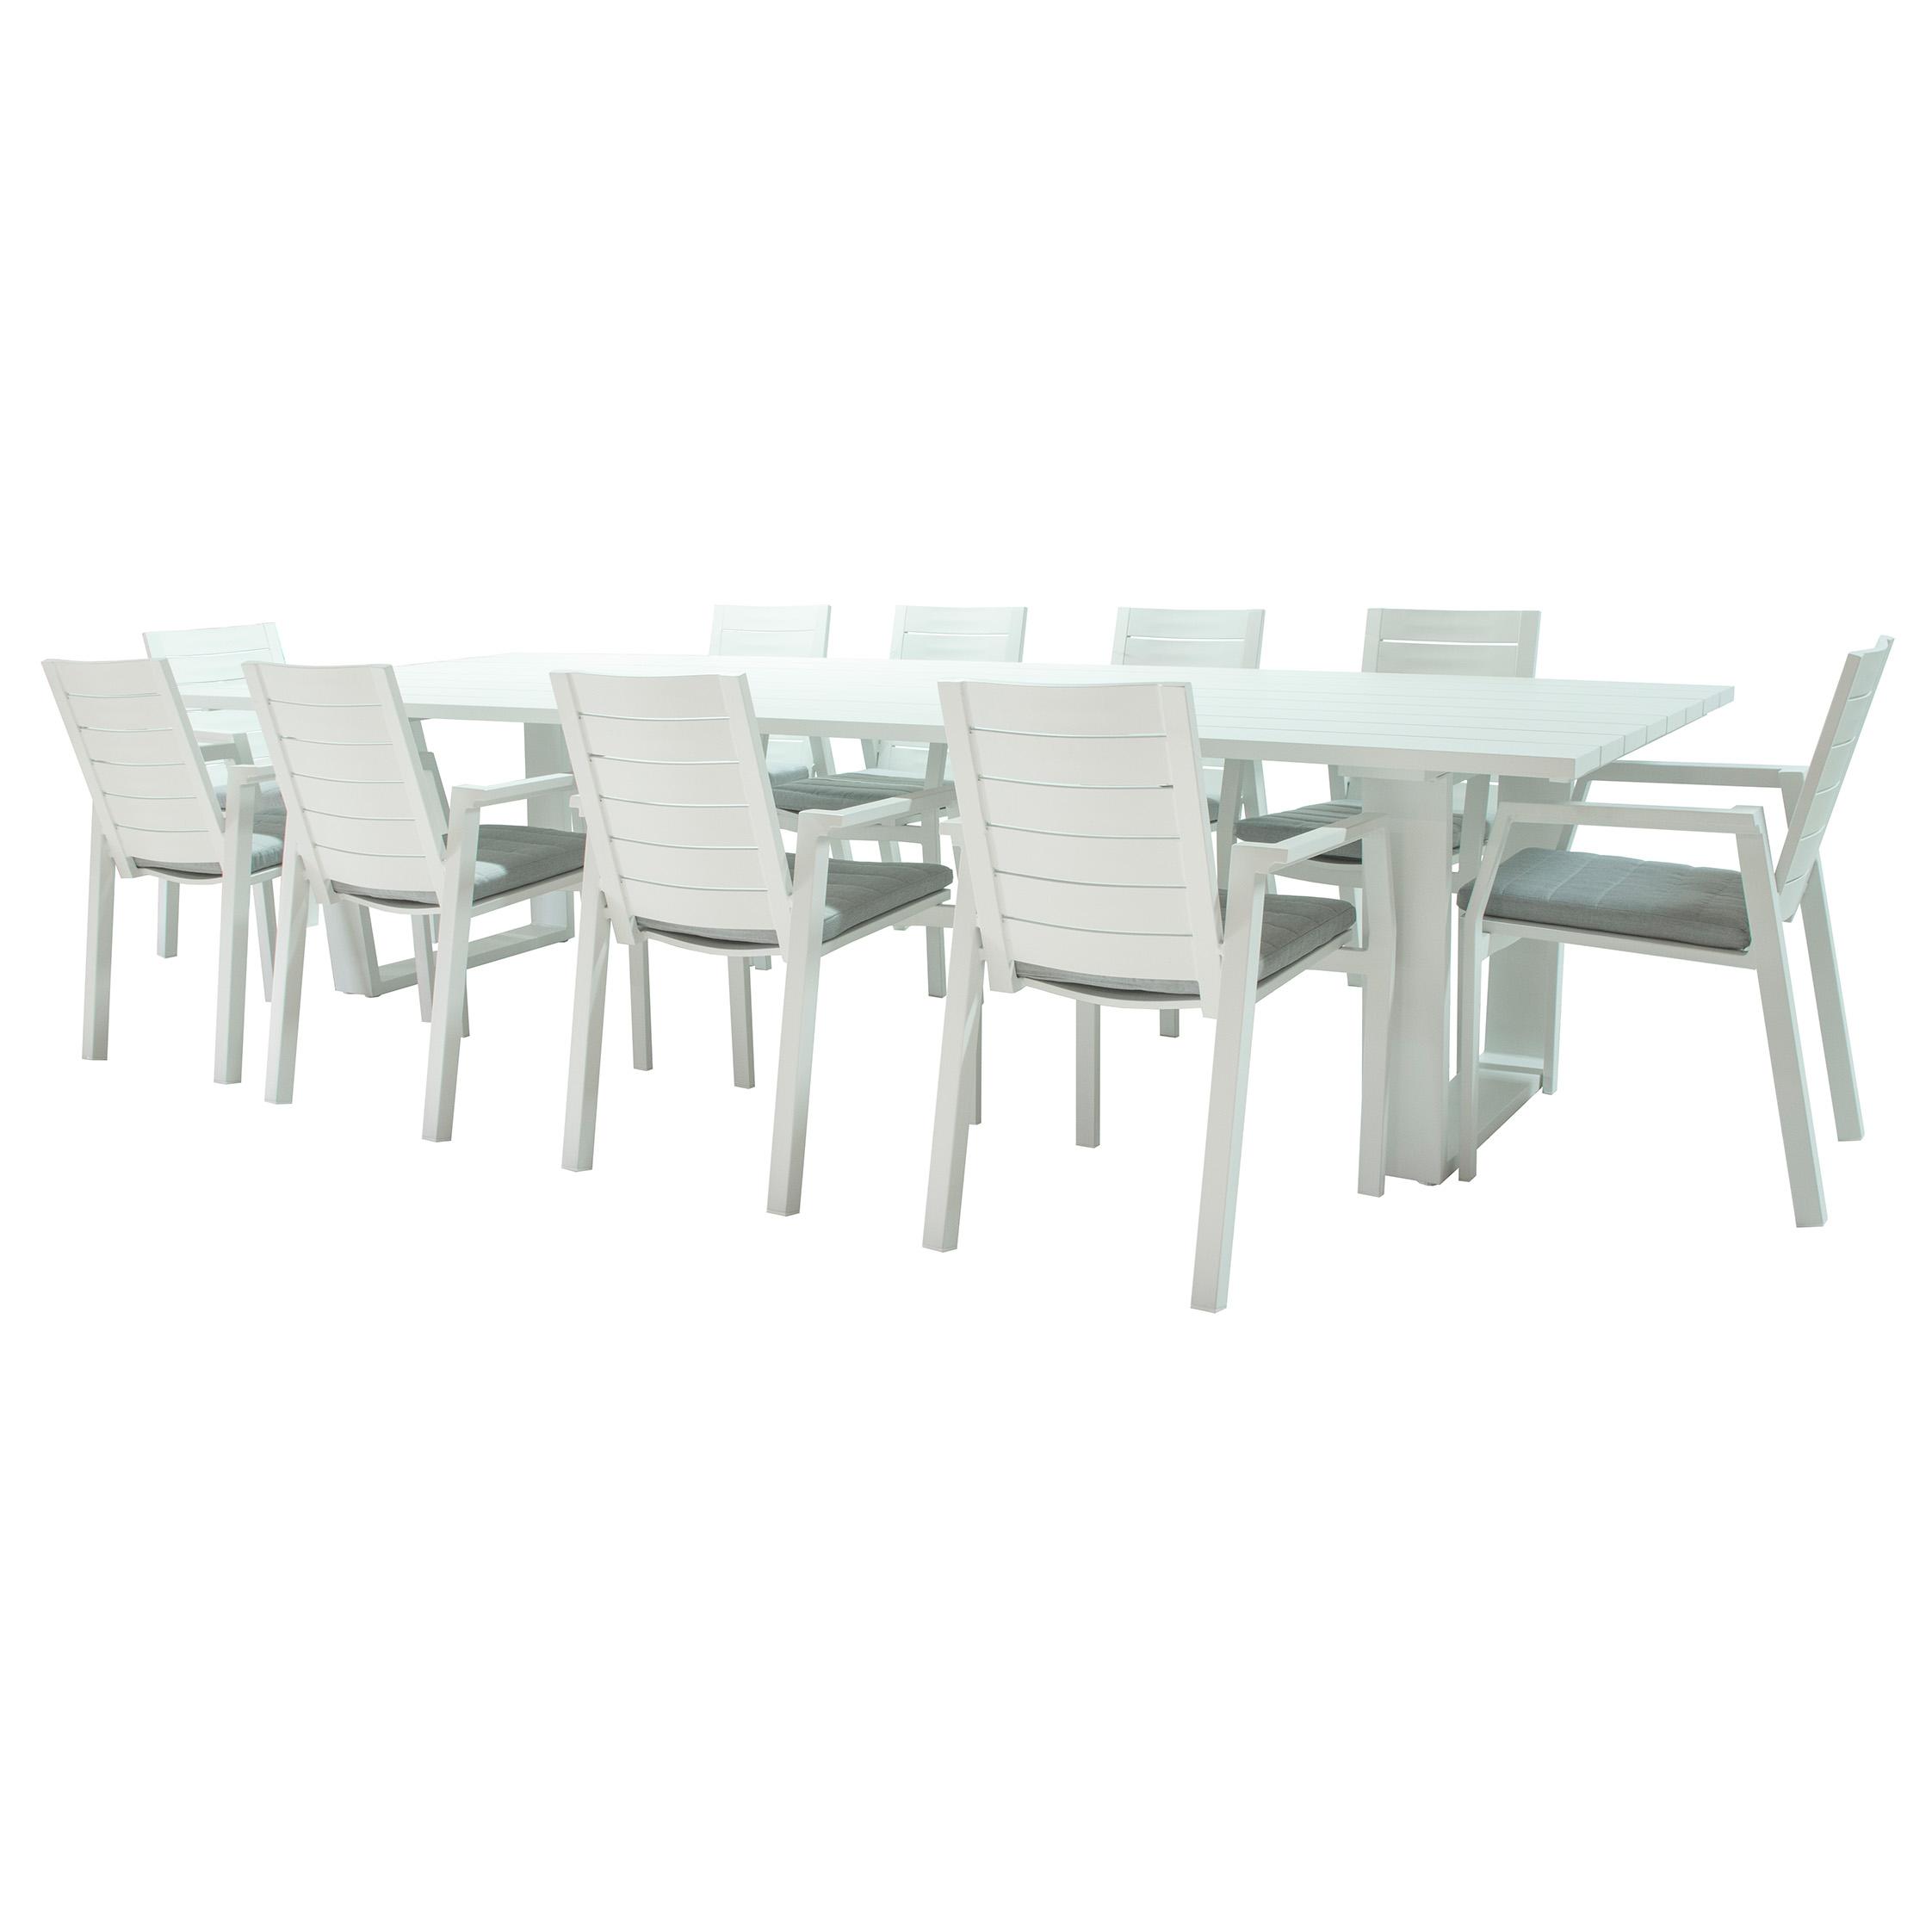 Retric 10 seater Dining set